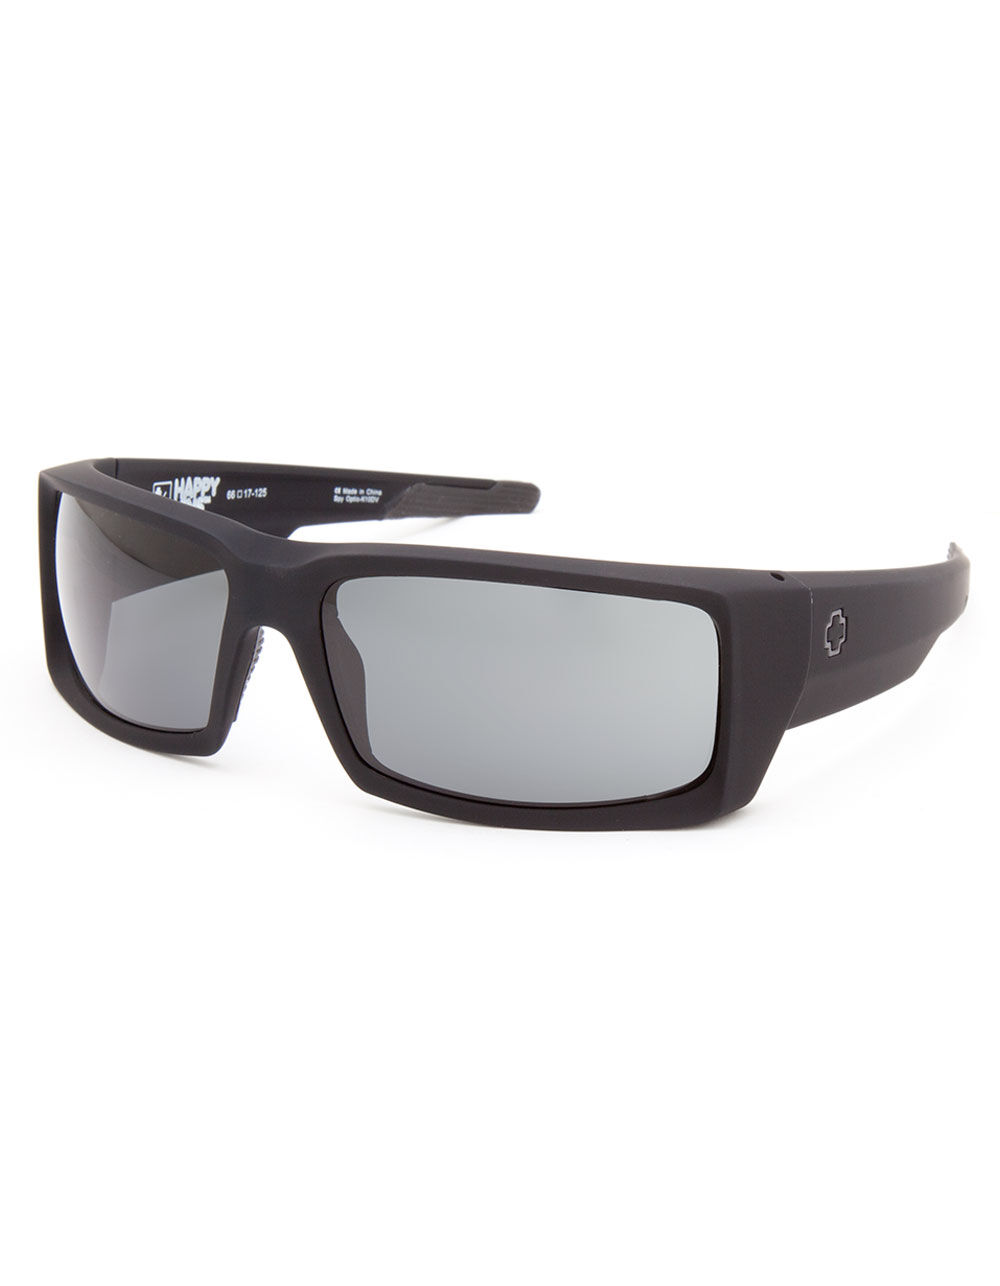 SPY Happy Lens General Sunglasses